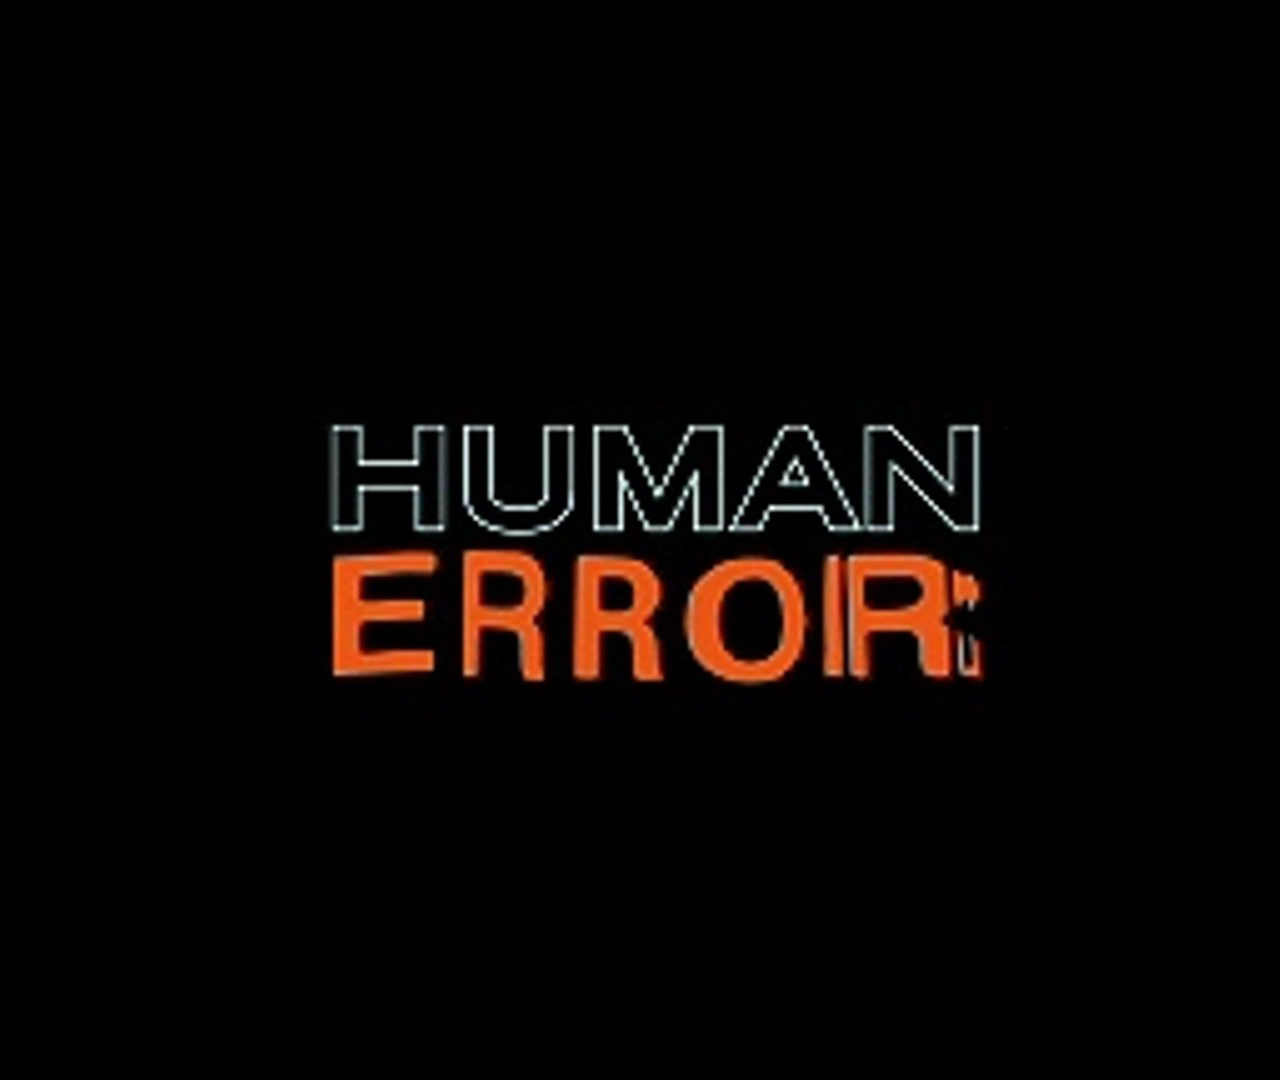 901 Human Error